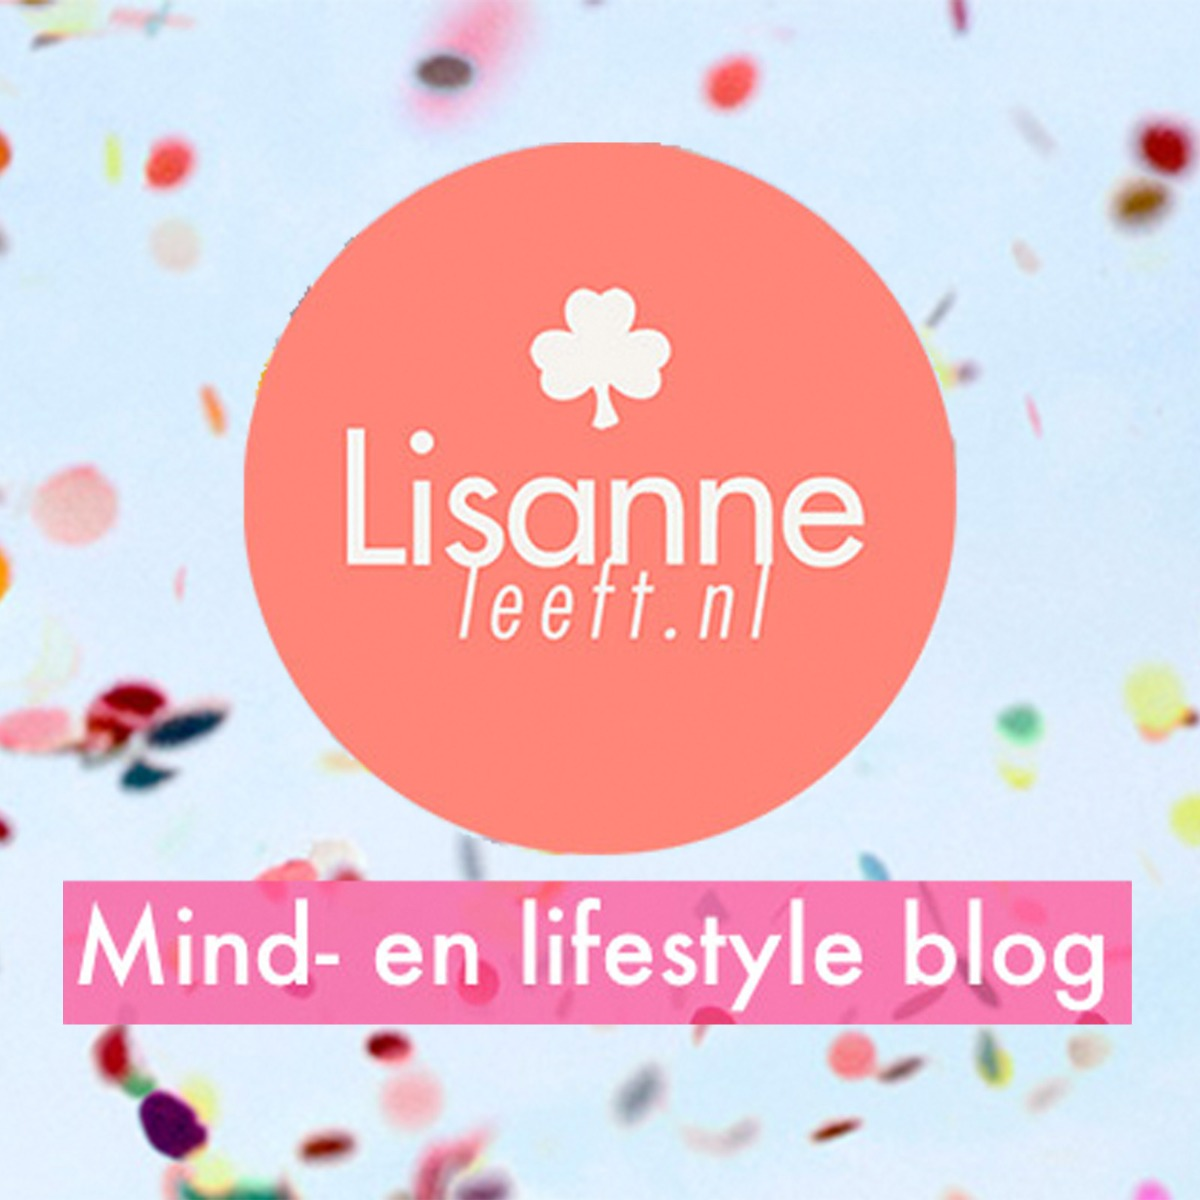 Lisanne Leeft